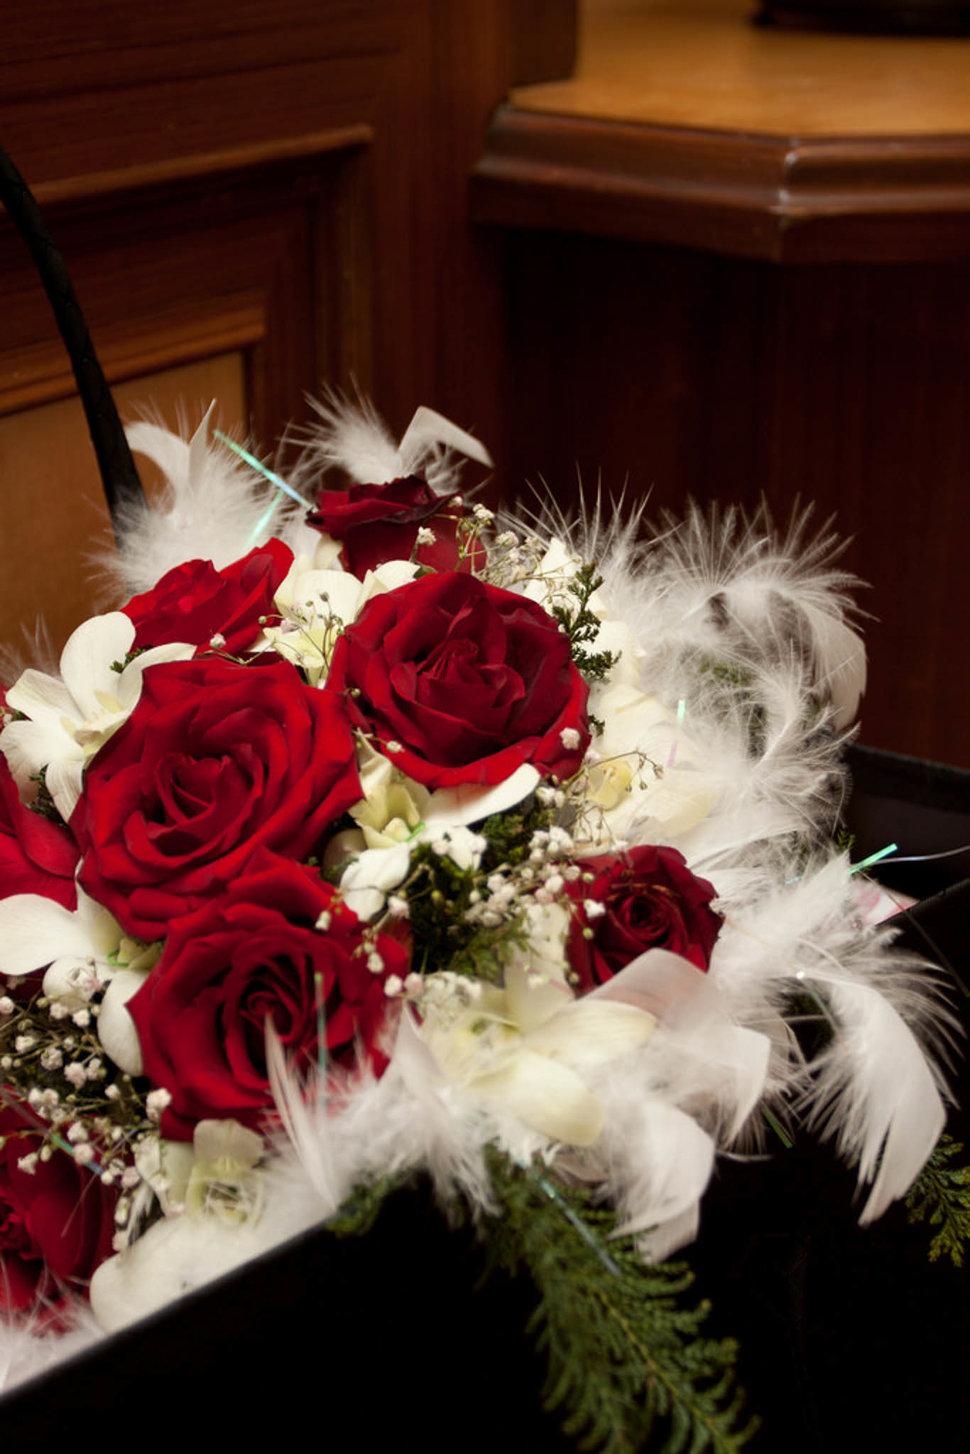 18PHOTO-佳成❤️ 玨萍(編號:220165) - 18PHOTO 婚紗影像攝影工作室 - 結婚吧